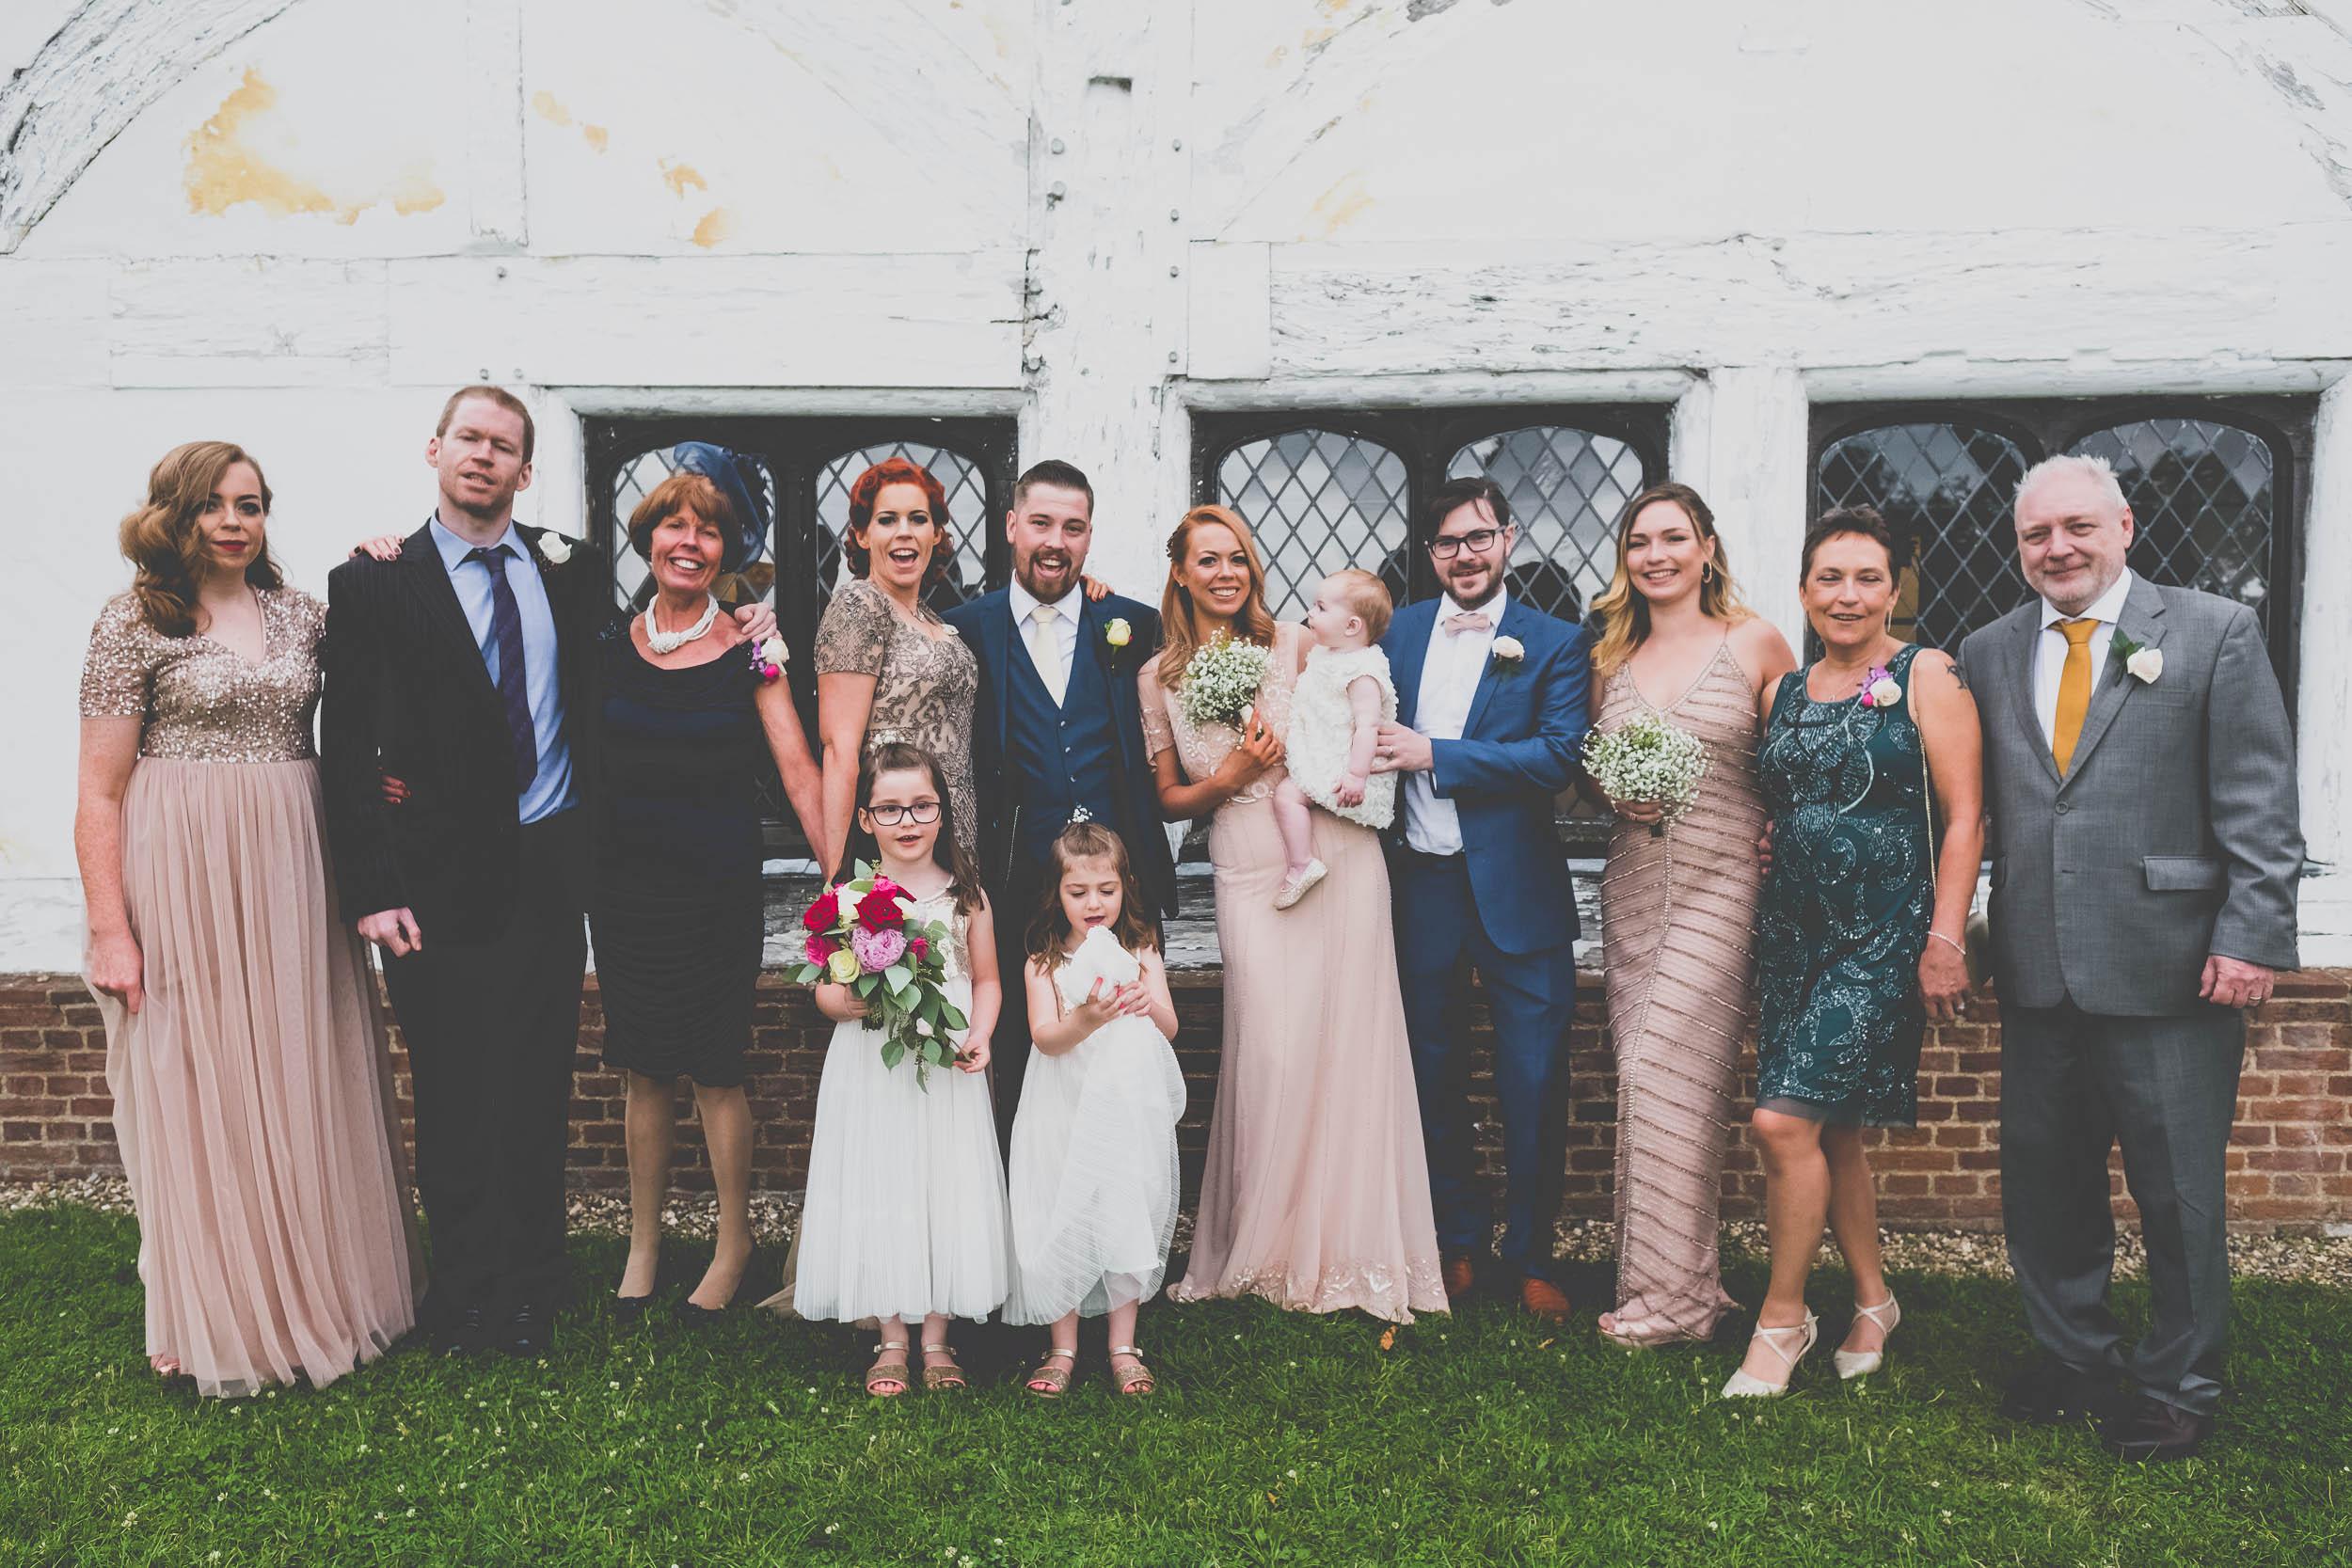 queen-elizabeths-hunting-lodge-epping-forest-wedding177.jpg